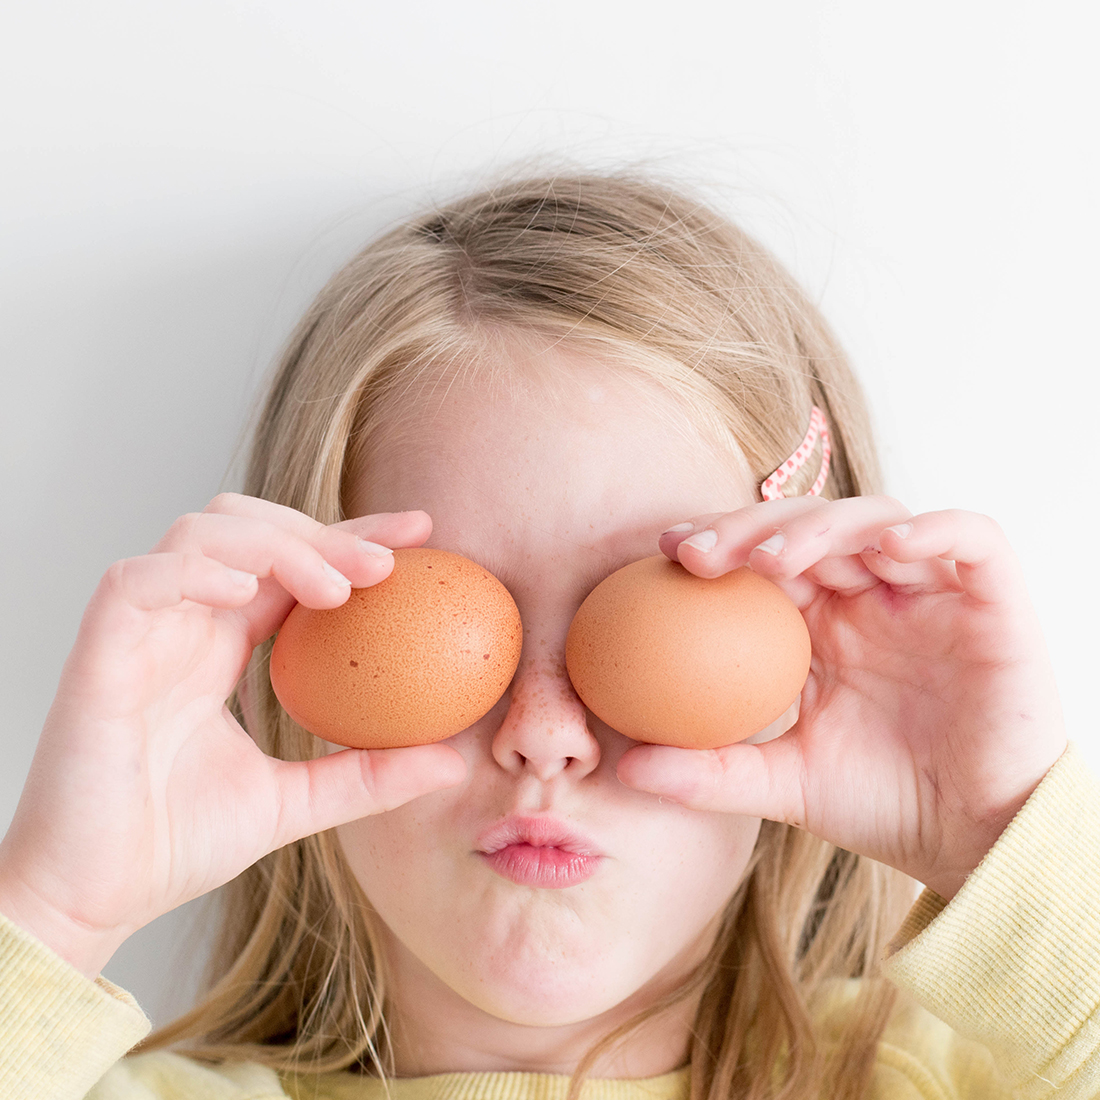 baby, kiddiwinks, childcare, warriewood, education, organic, child, kids, children, pre-school, learning, centre, northern beaches, imagination, happy, Sydney, sydneykids, family